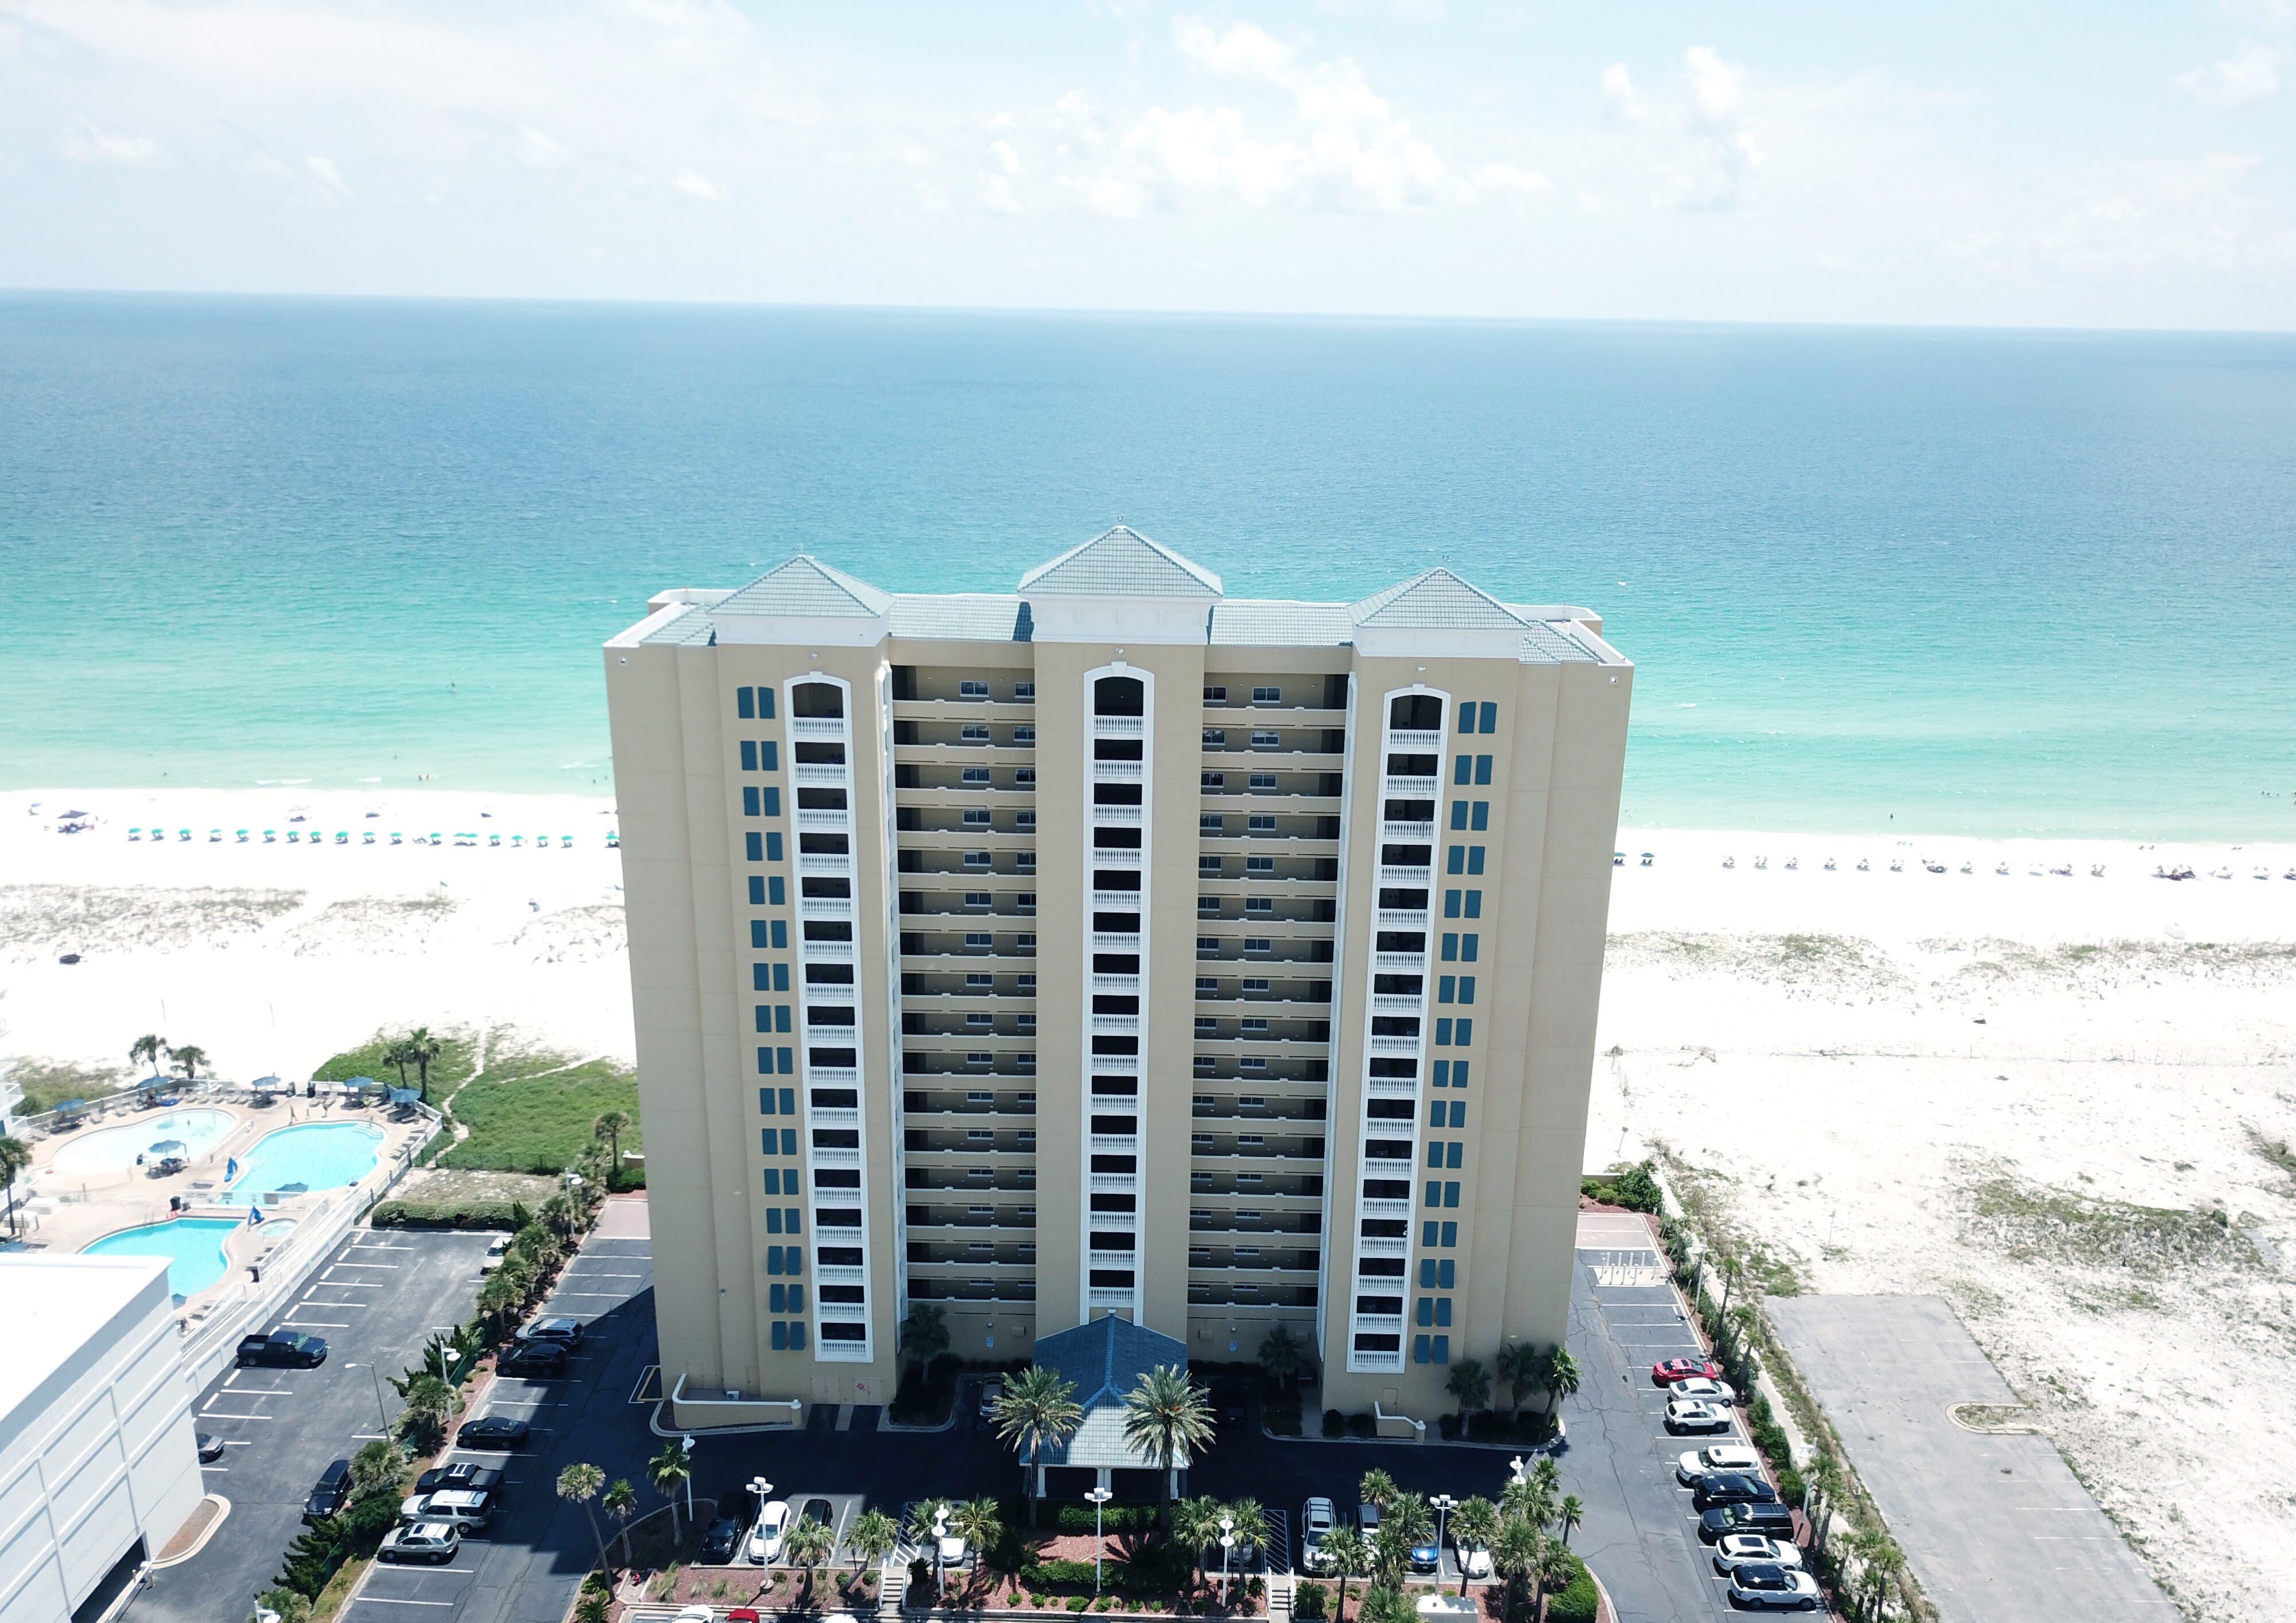 Emerald Isle #1105 Condo rental in Emerald Isle Pensacola Beach in Pensacola Beach Florida - #32